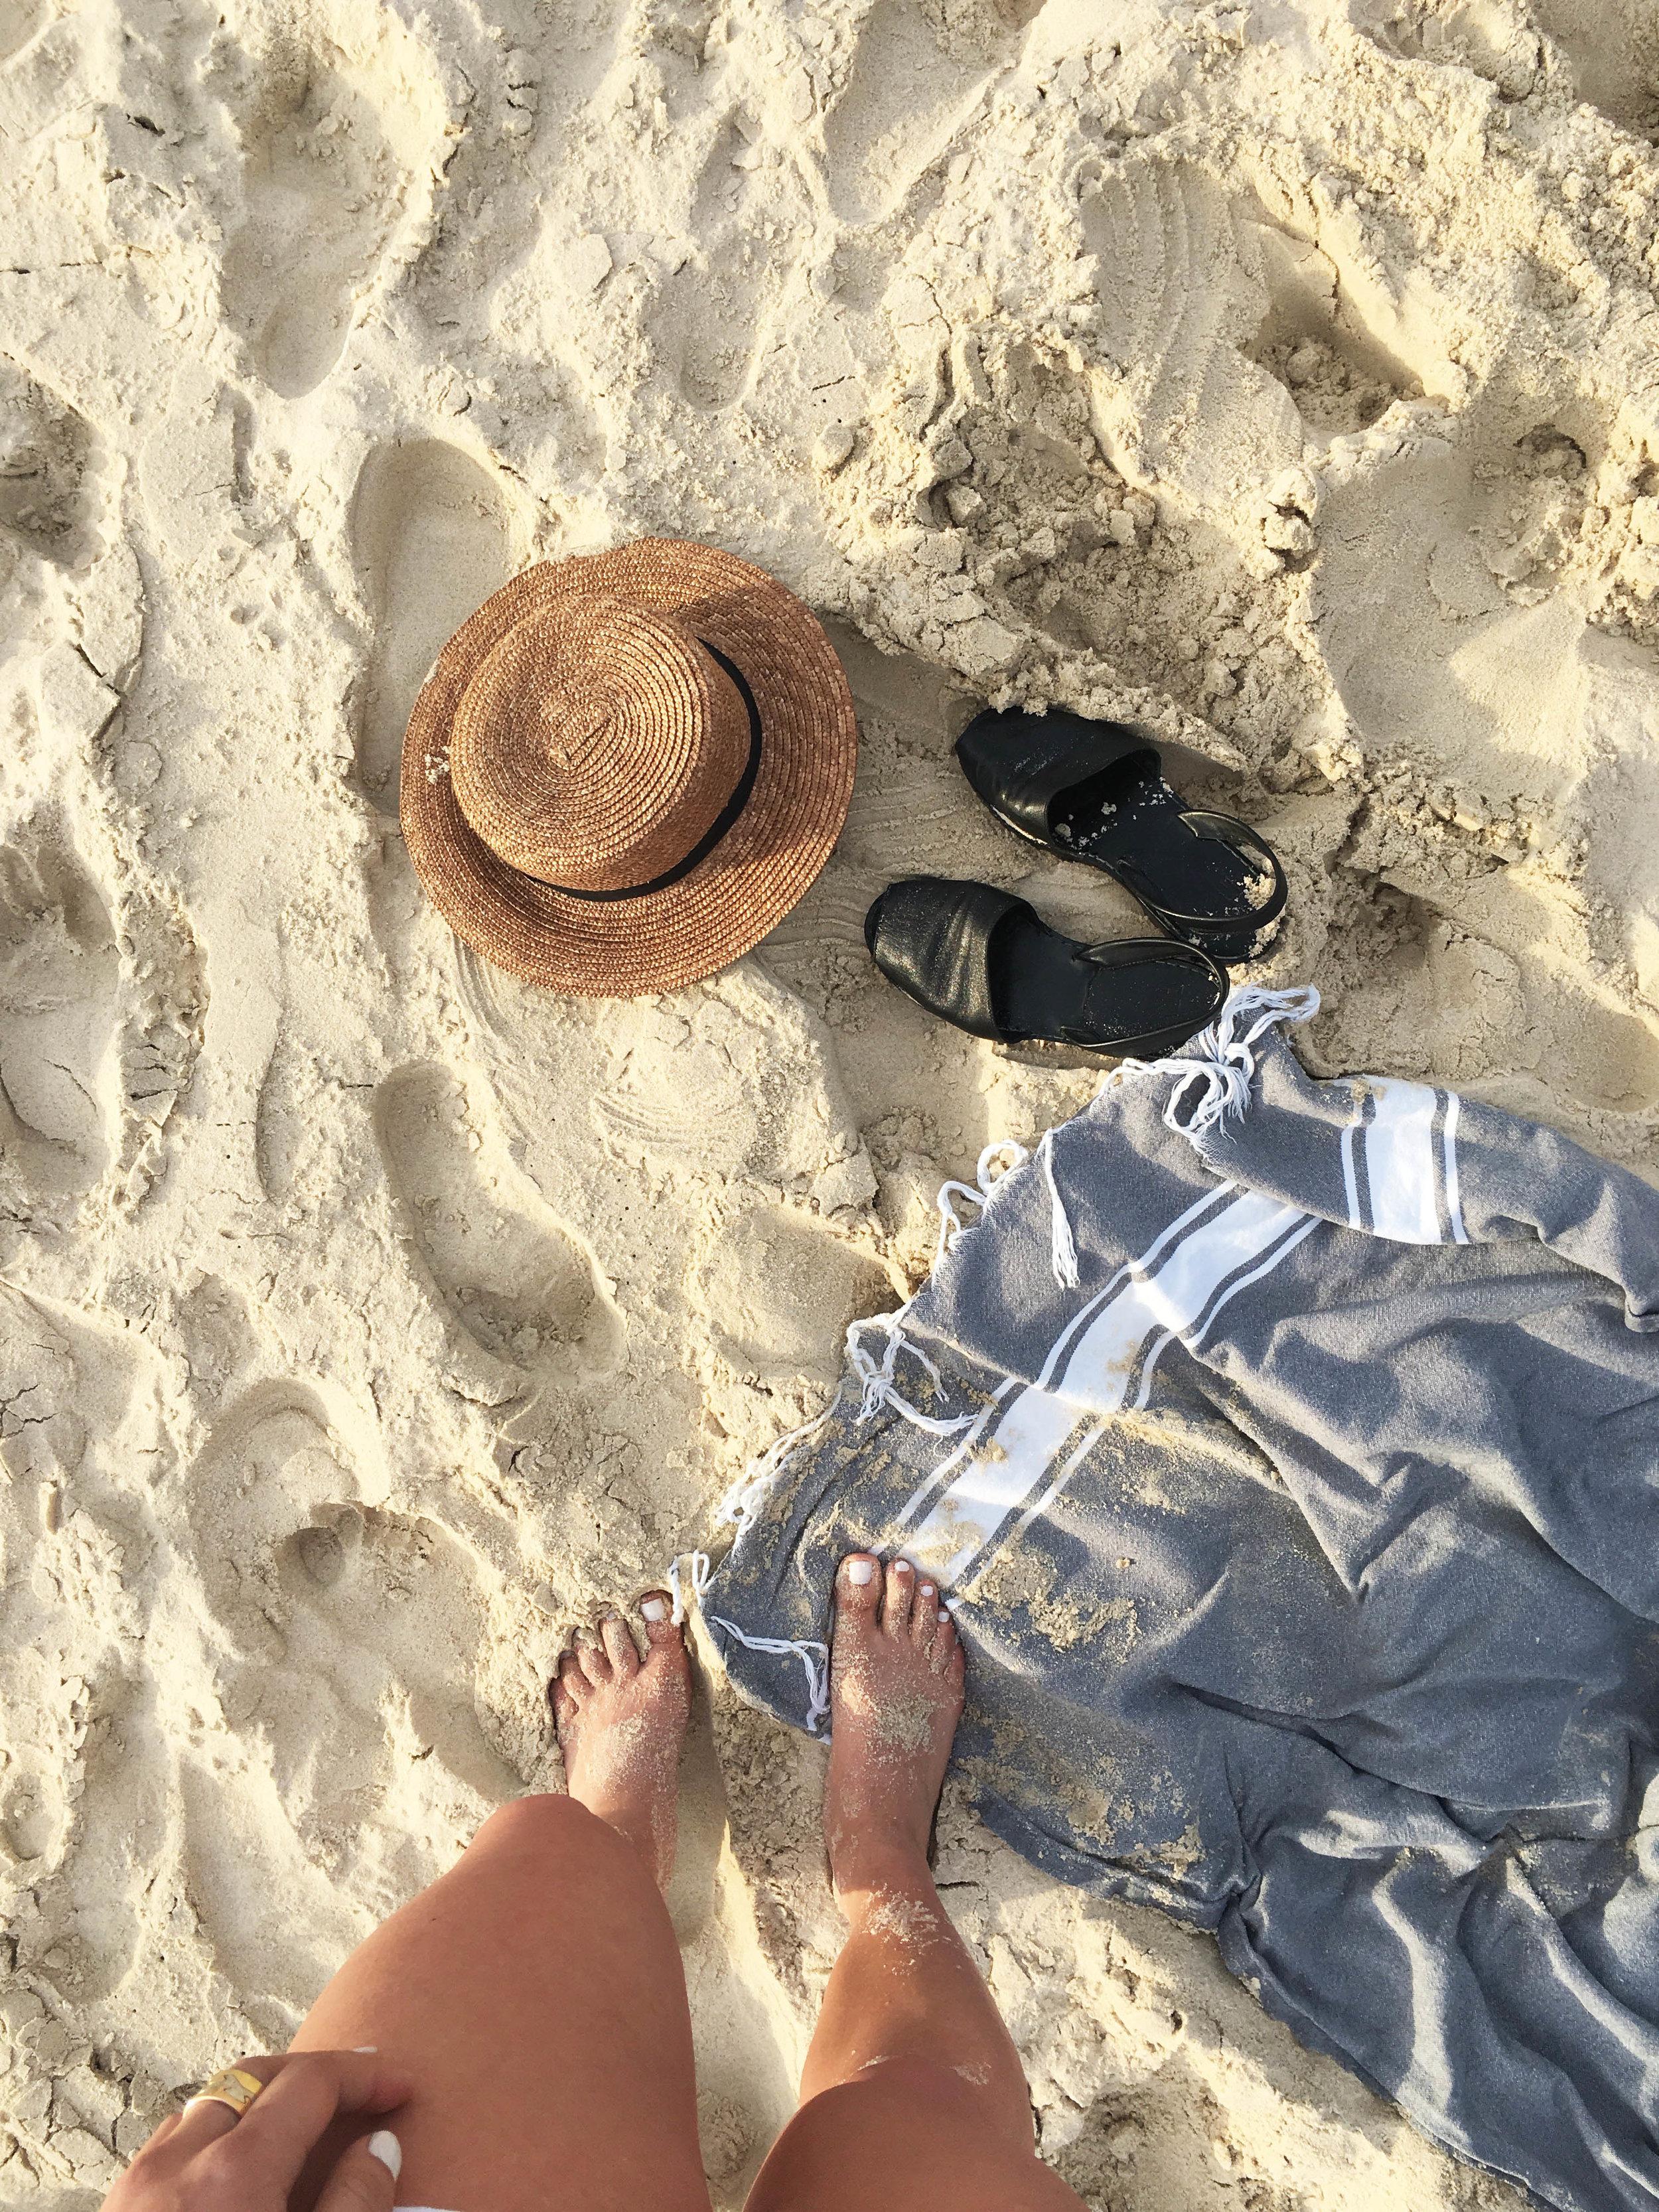 Lozidaze_Wategos-Beach_01